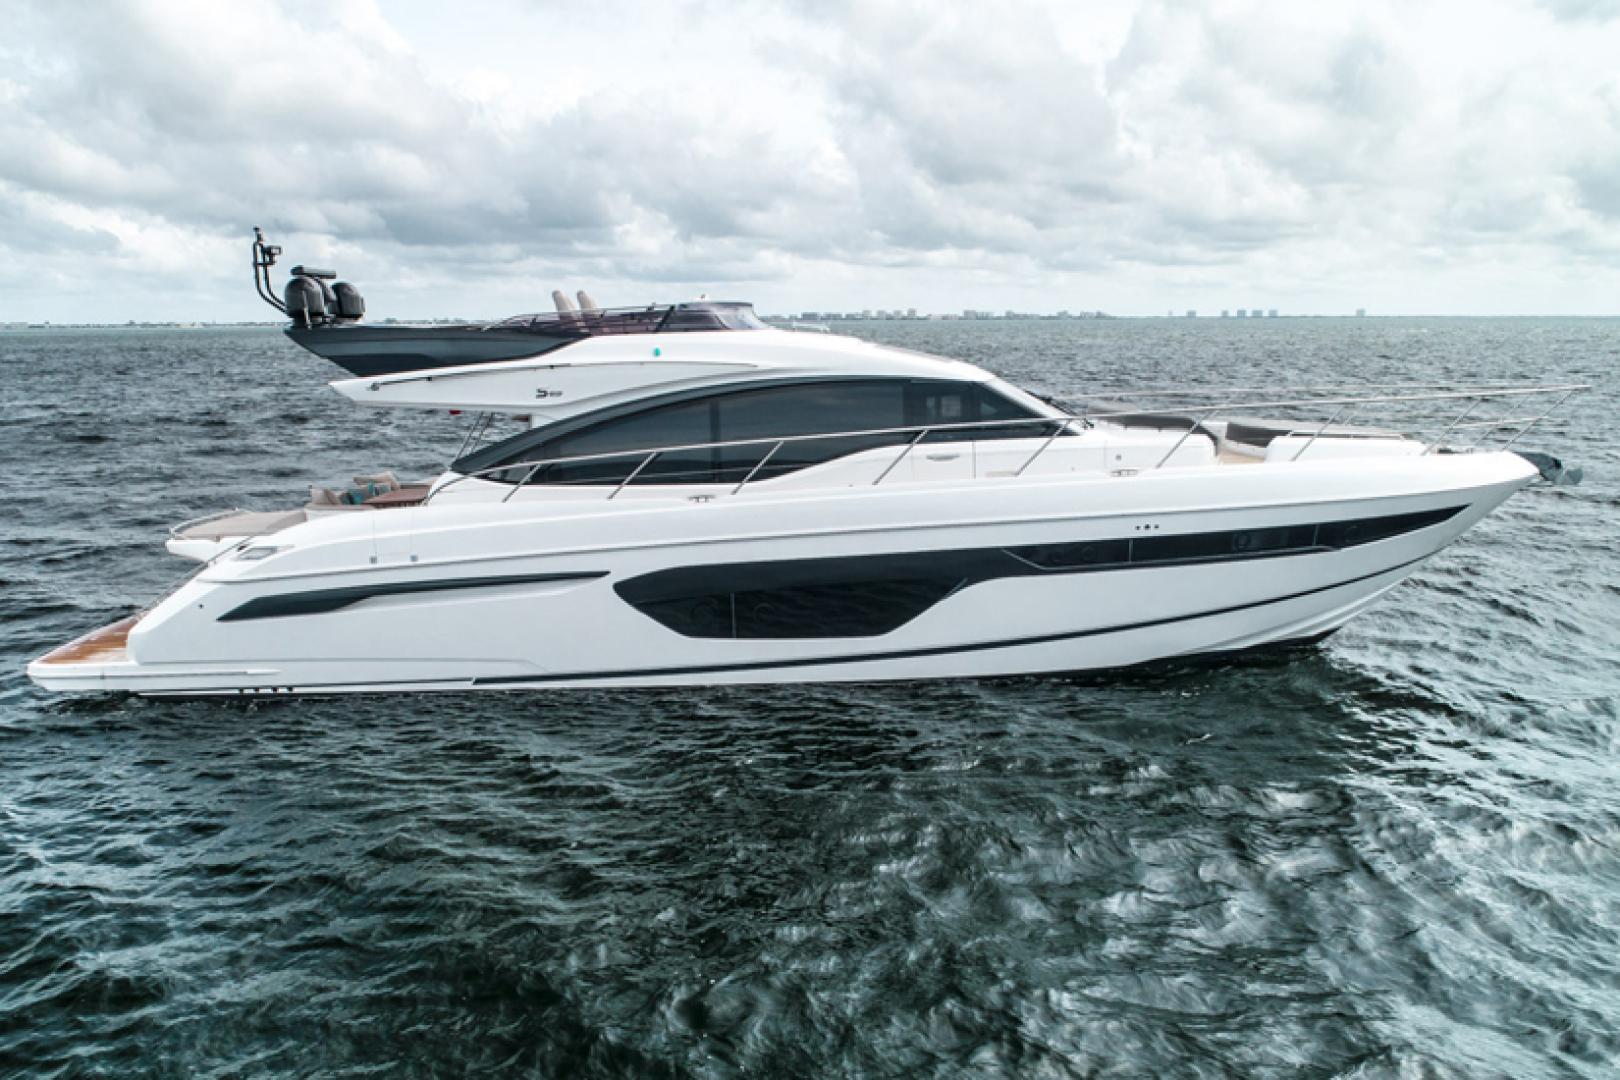 Princess-S65 2019-Paragon Cape Coral-Florida-United States-2019 65 Princess S65-Paragon-Profile-1510390 | Thumbnail